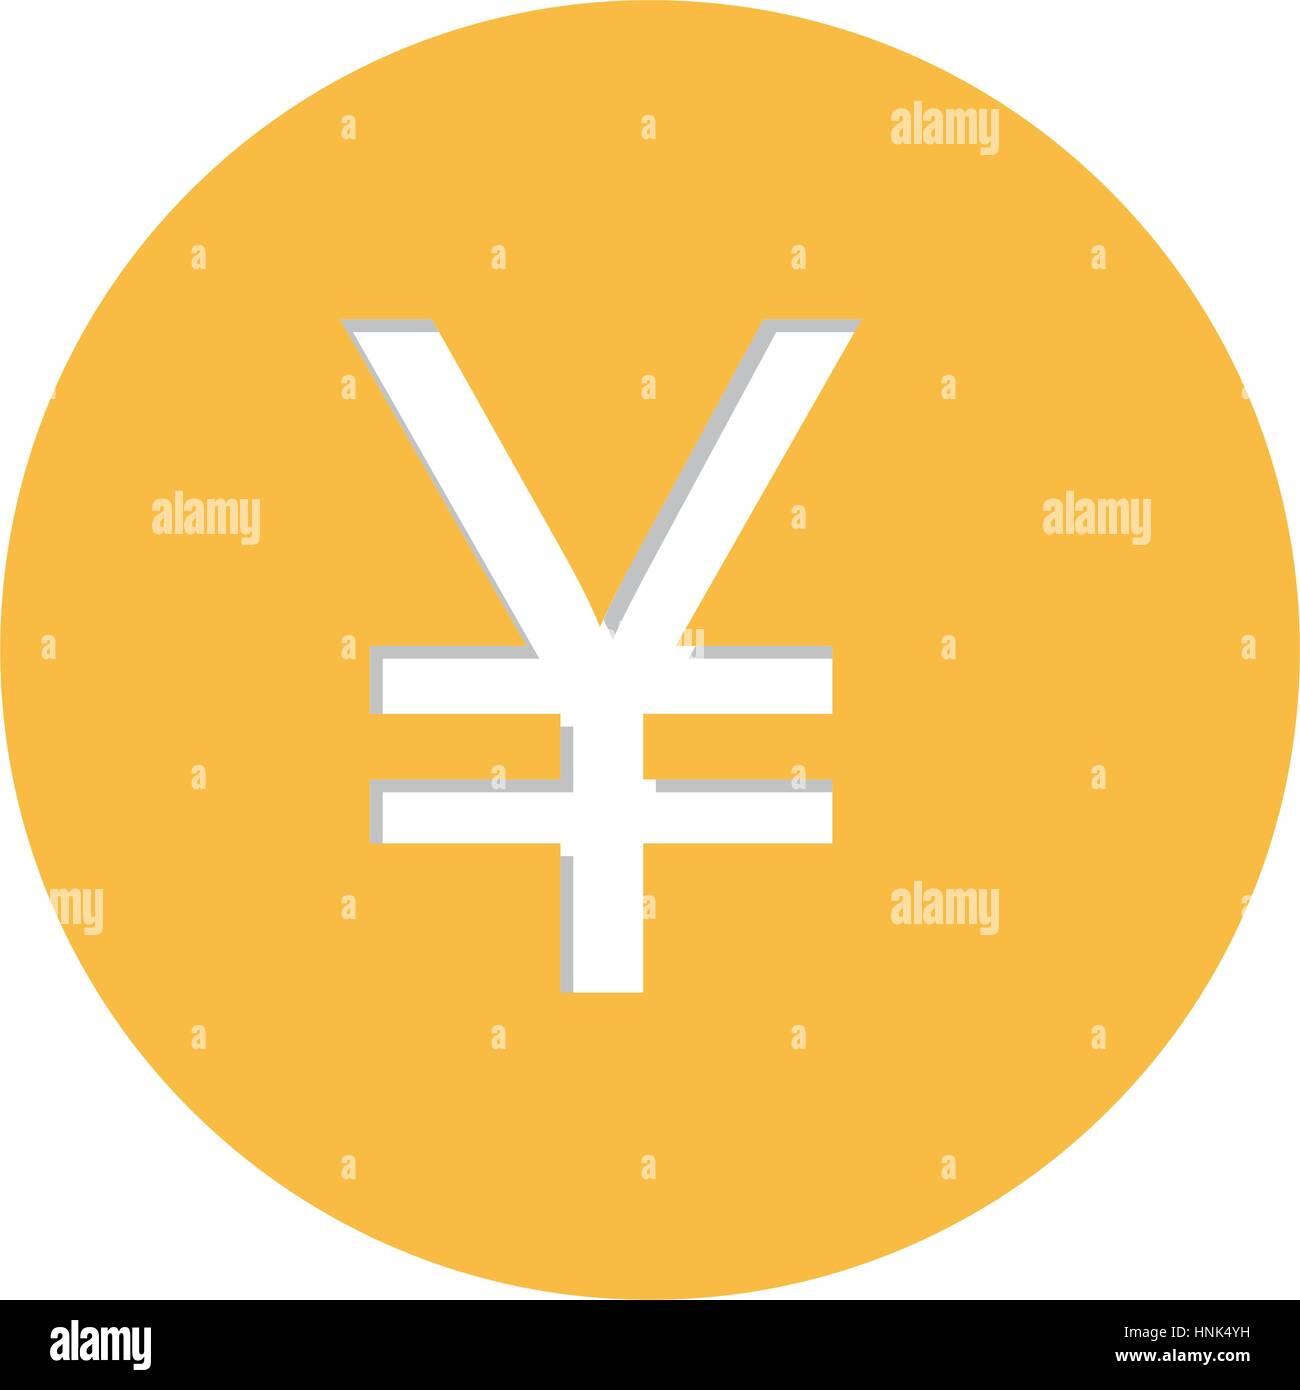 Yen currency symbol icon image vector illustration stock vector yen currency symbol icon image vector illustration biocorpaavc